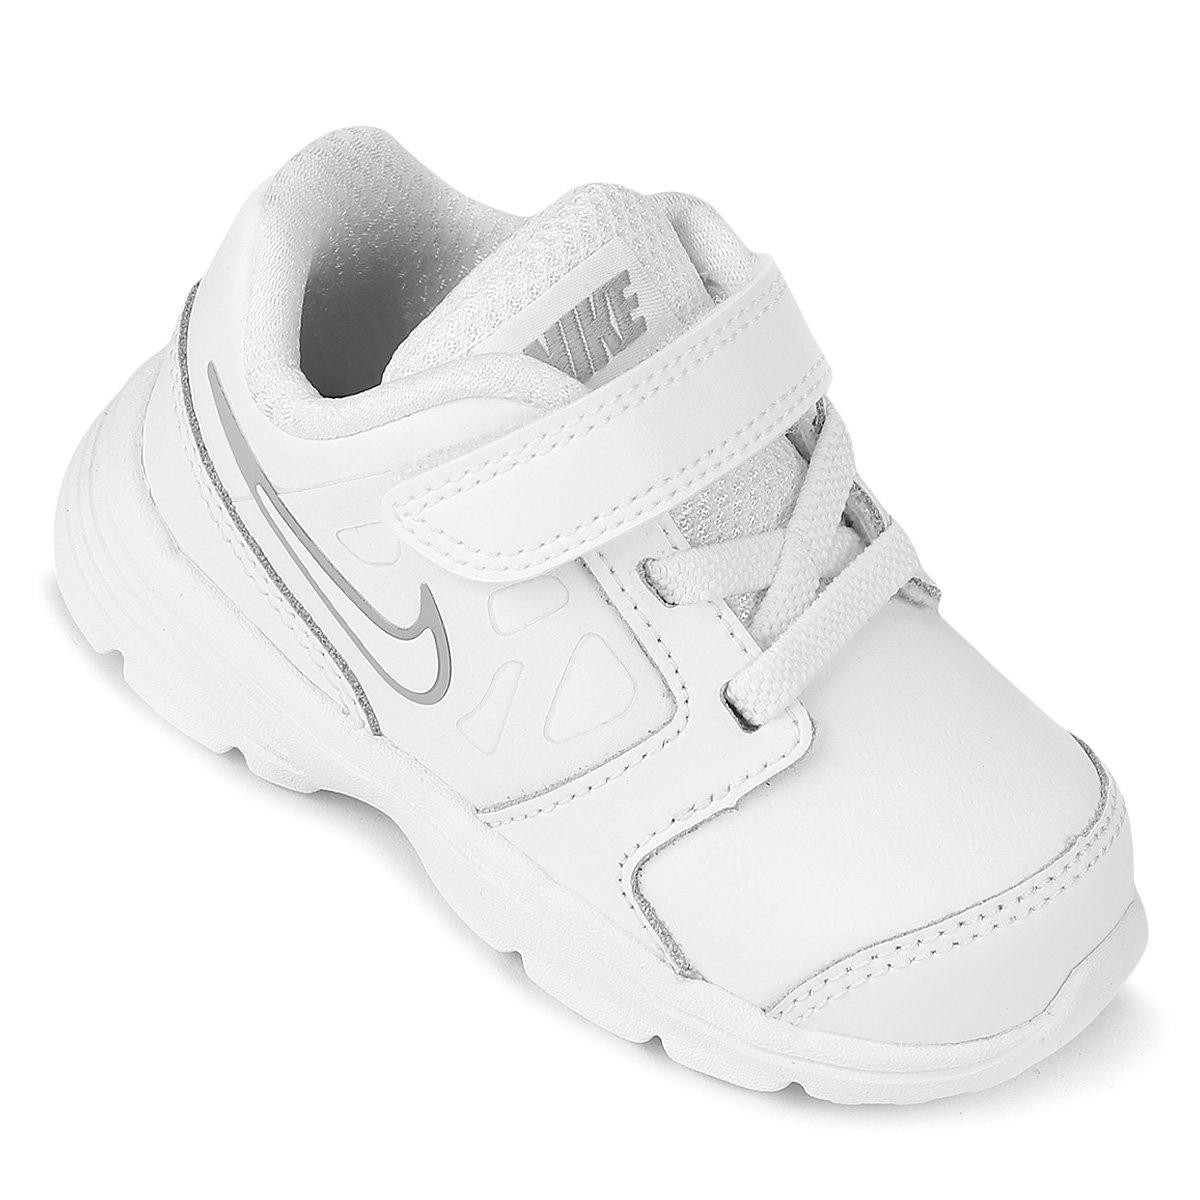 9fe8cfdc384 Tênis Infantil Nike Downshifter 6 Ltr Masculino